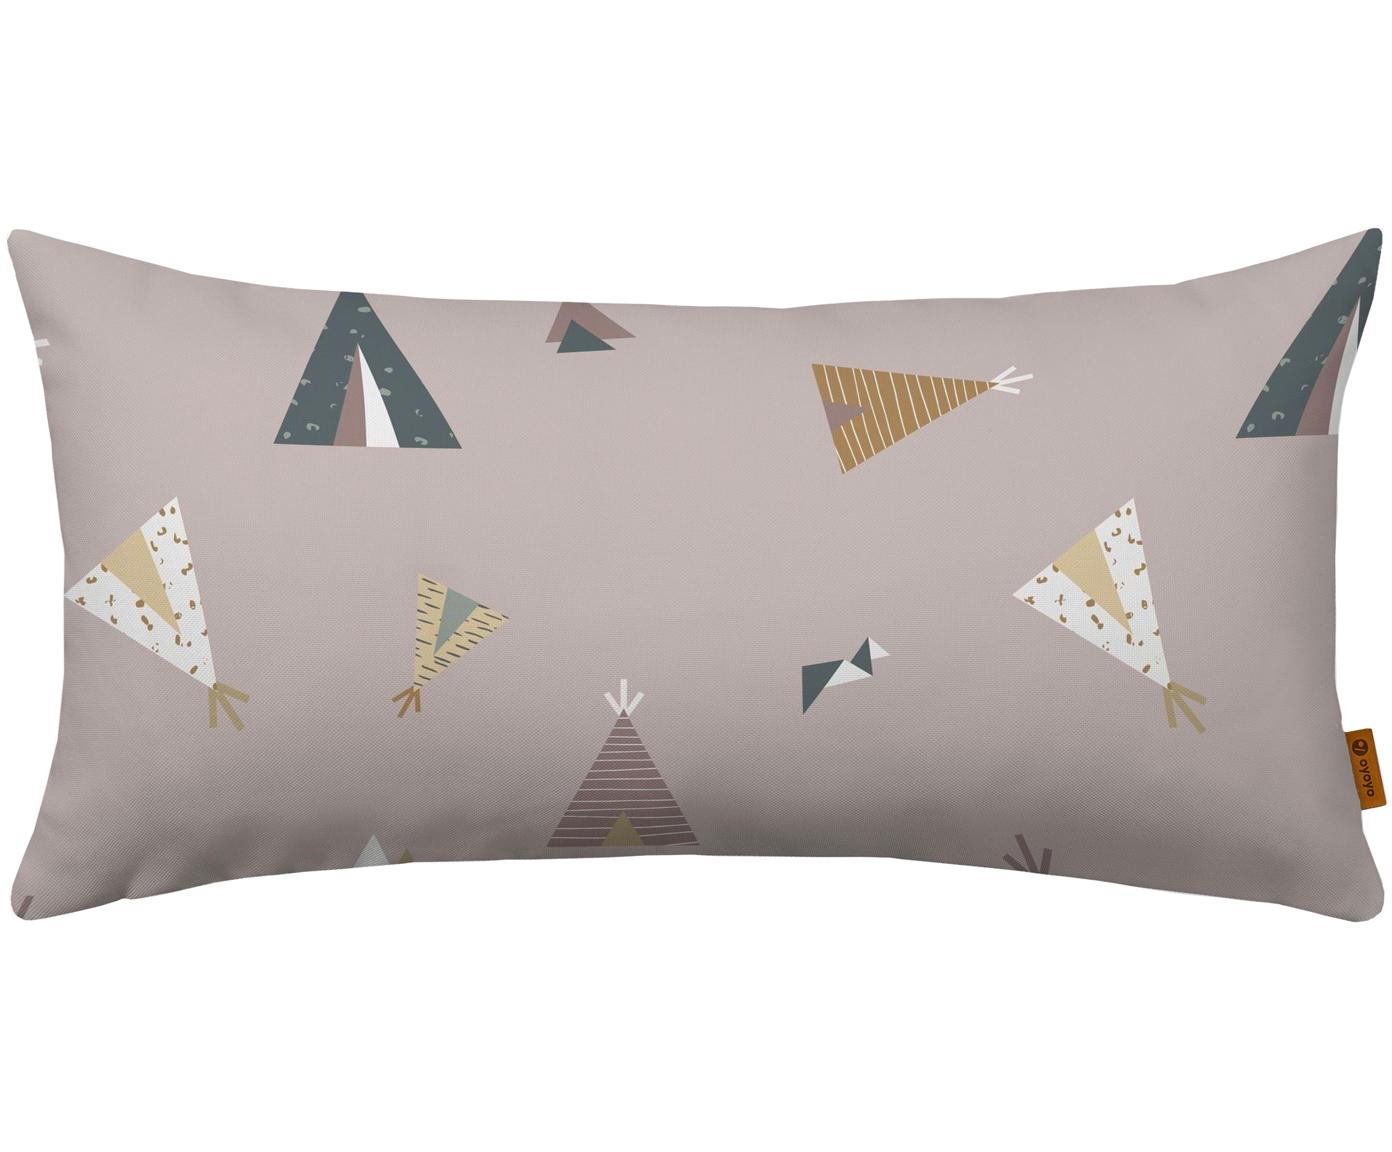 Cojín Teepee, con relleno, Funda: algodón, Rosa, multicolor, An 30 x L 60 cm